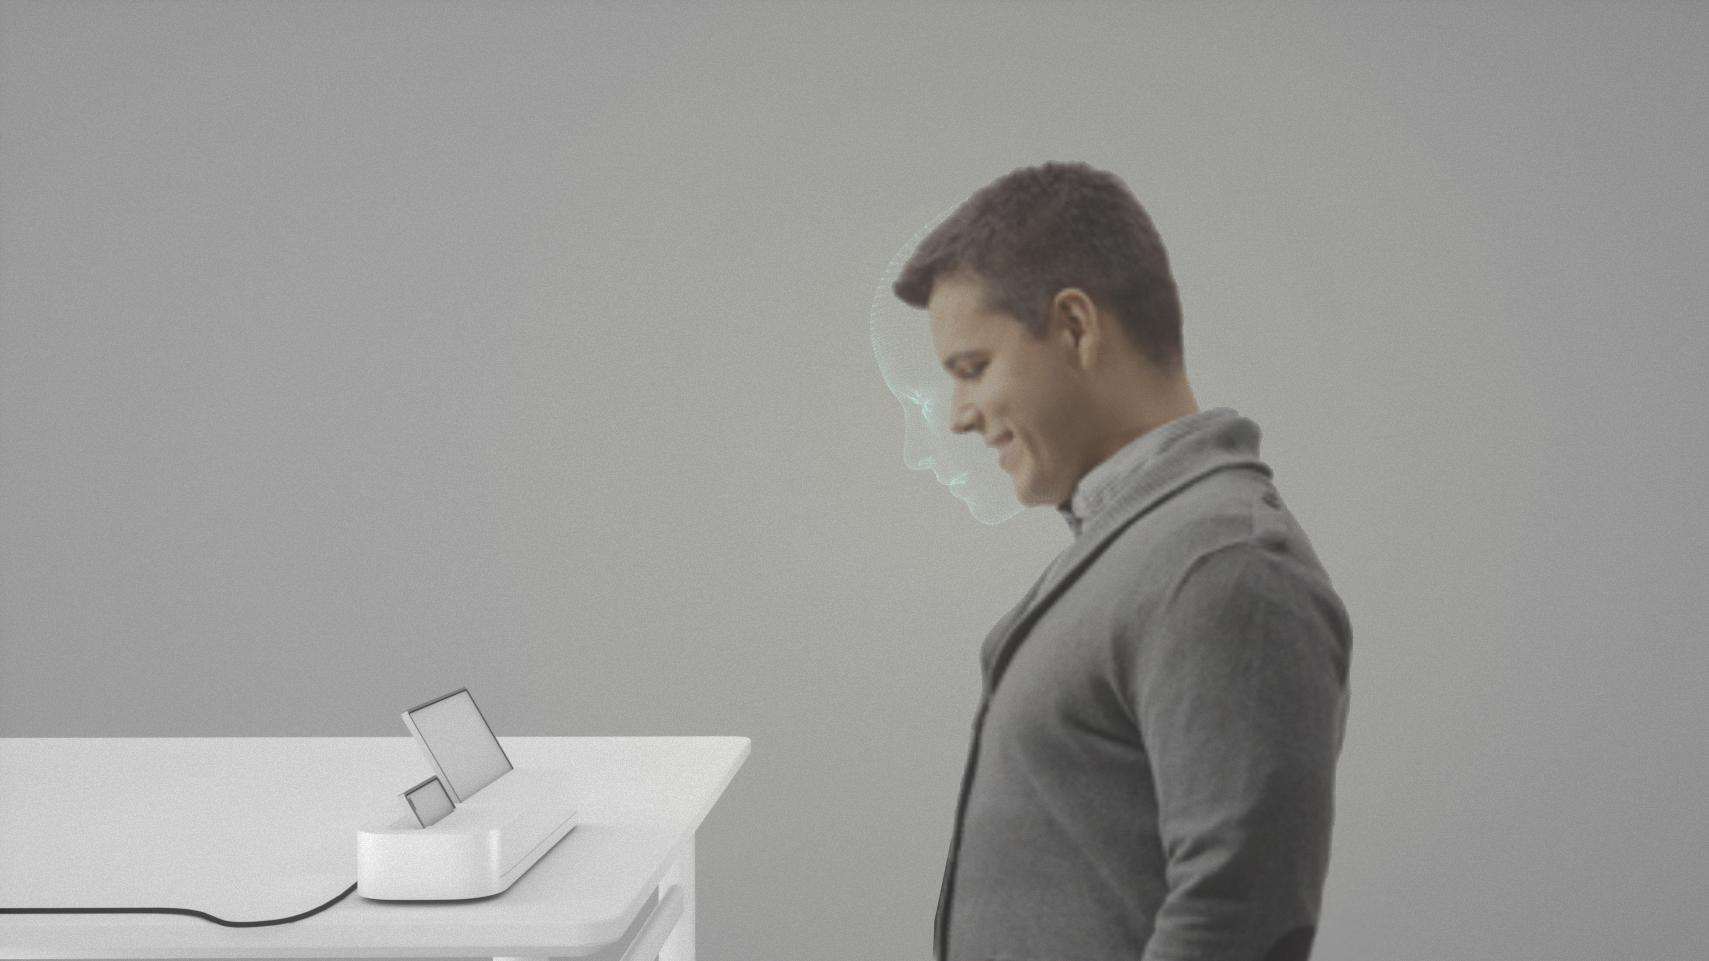 ComputerVisionRender